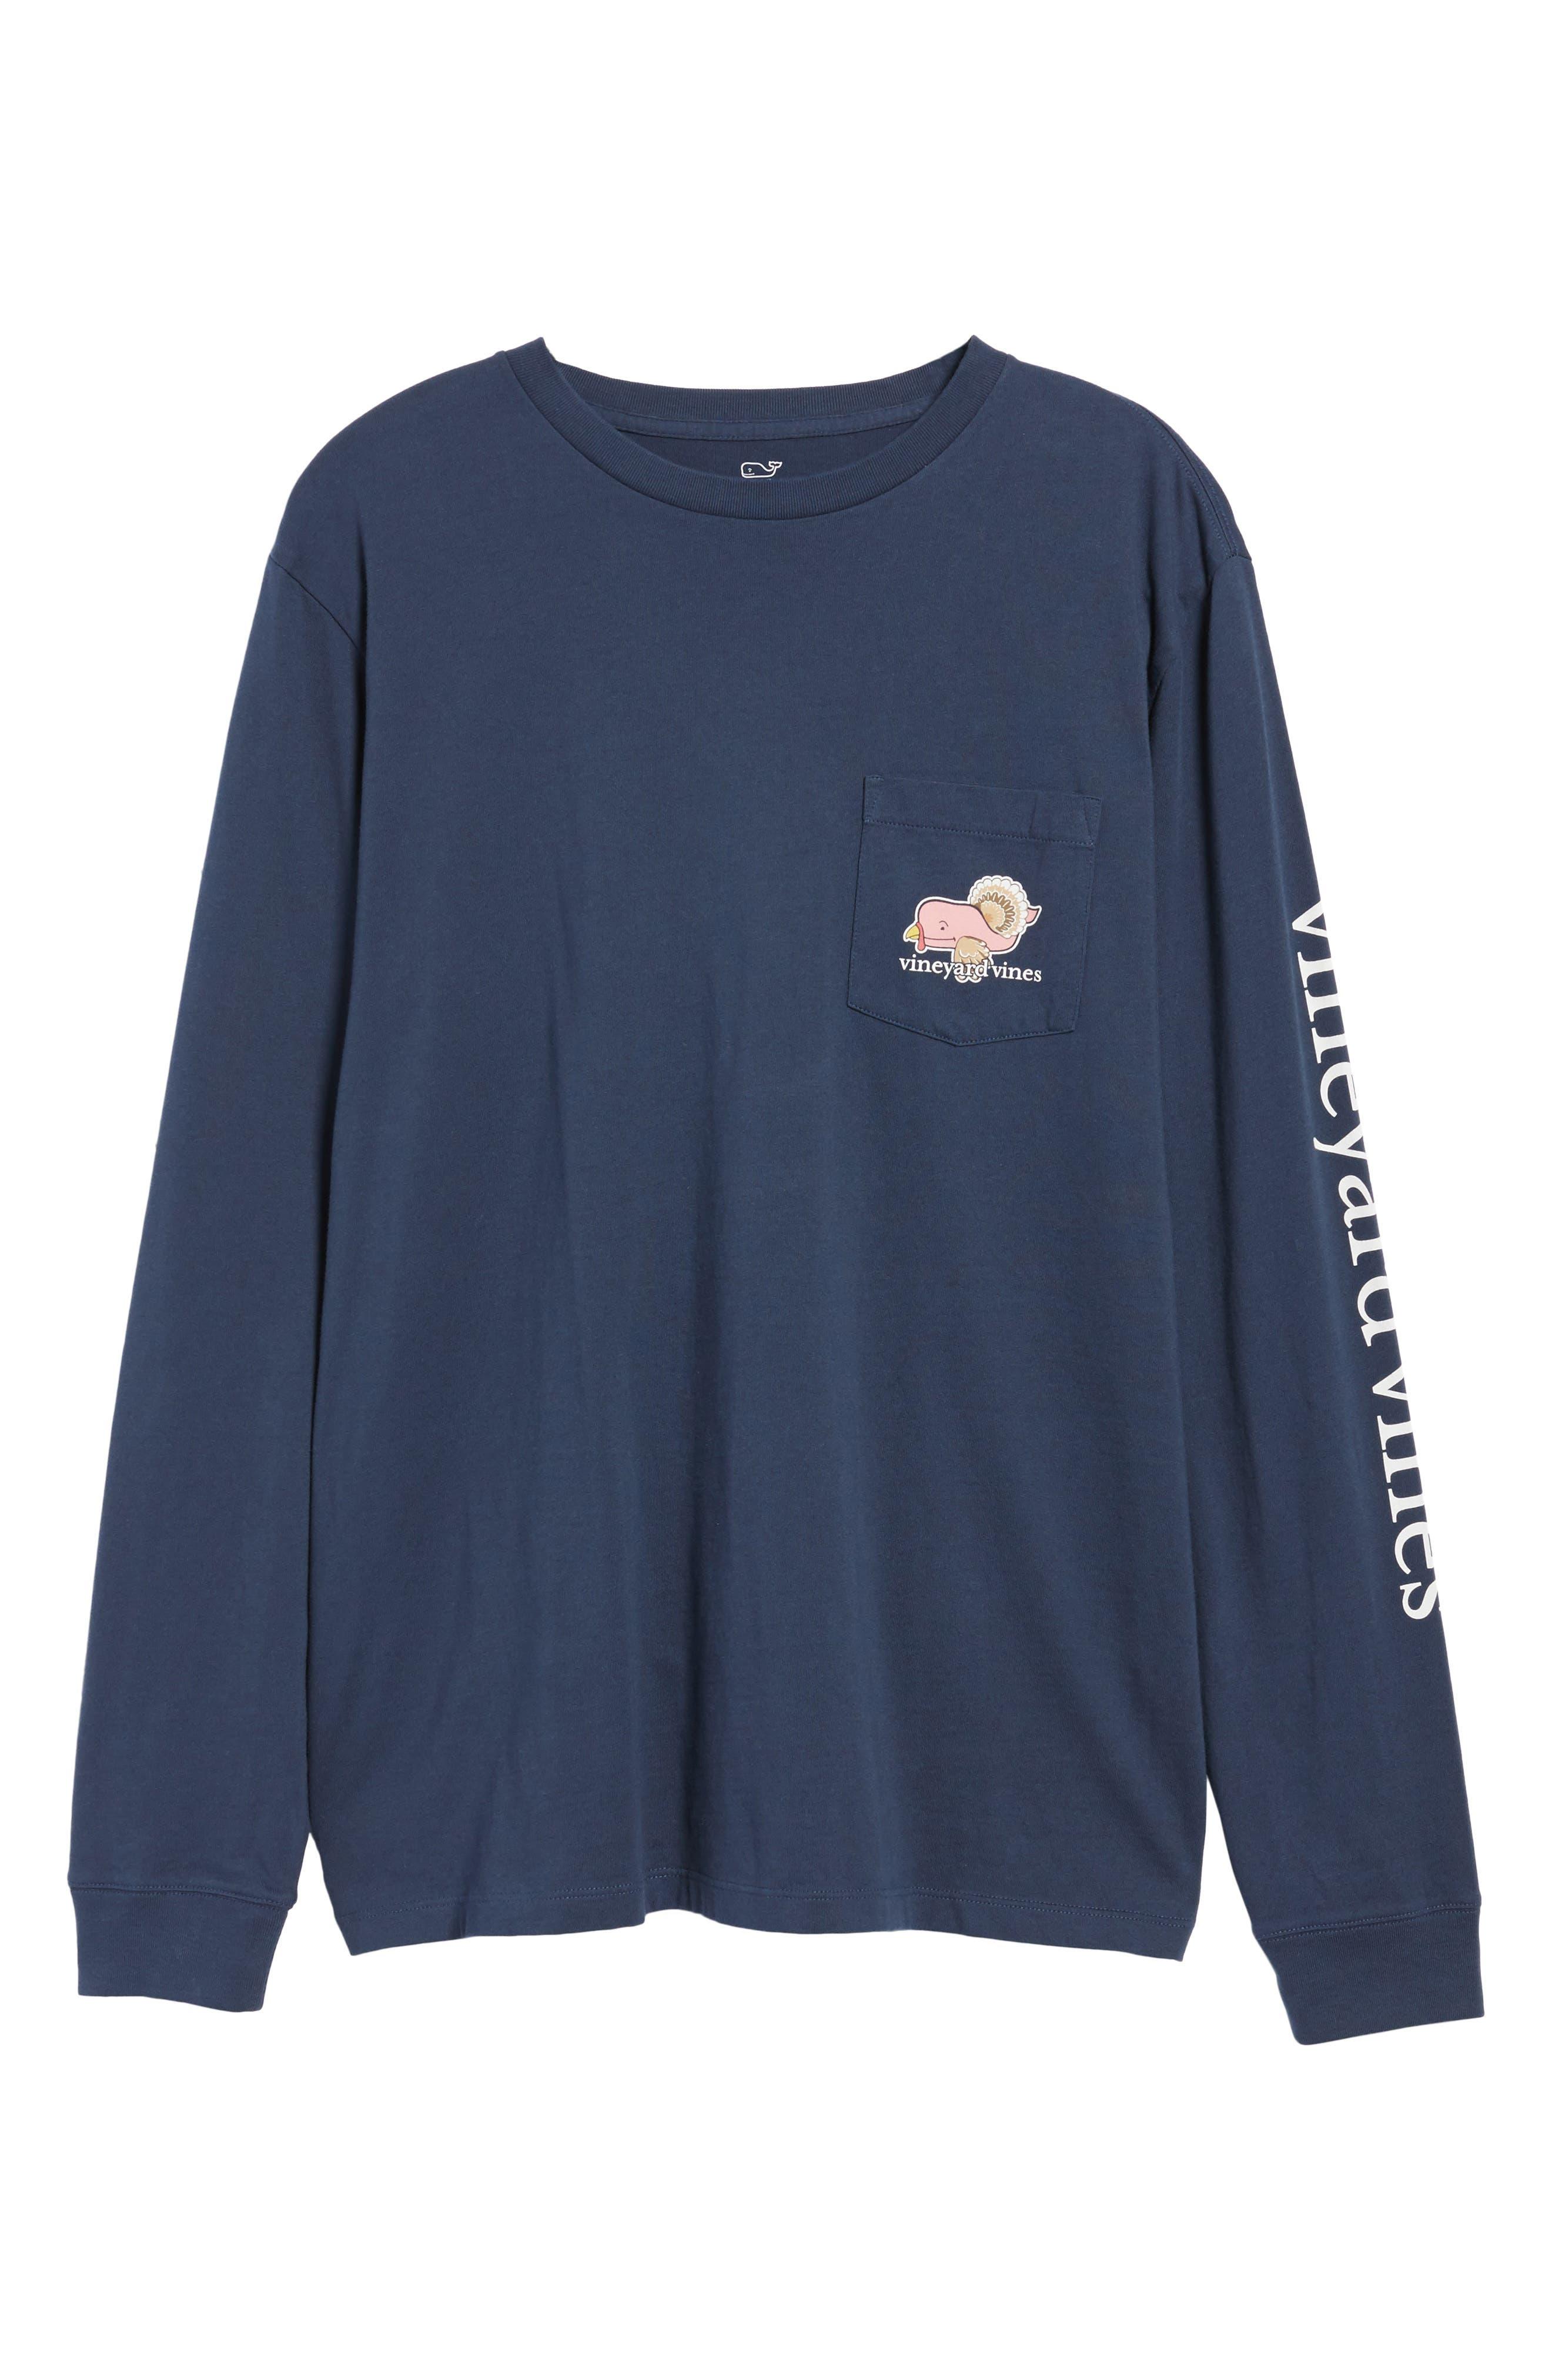 Turkey Whale Graphic Long Sleeve Pocket T-Shirt,                             Alternate thumbnail 6, color,                             406